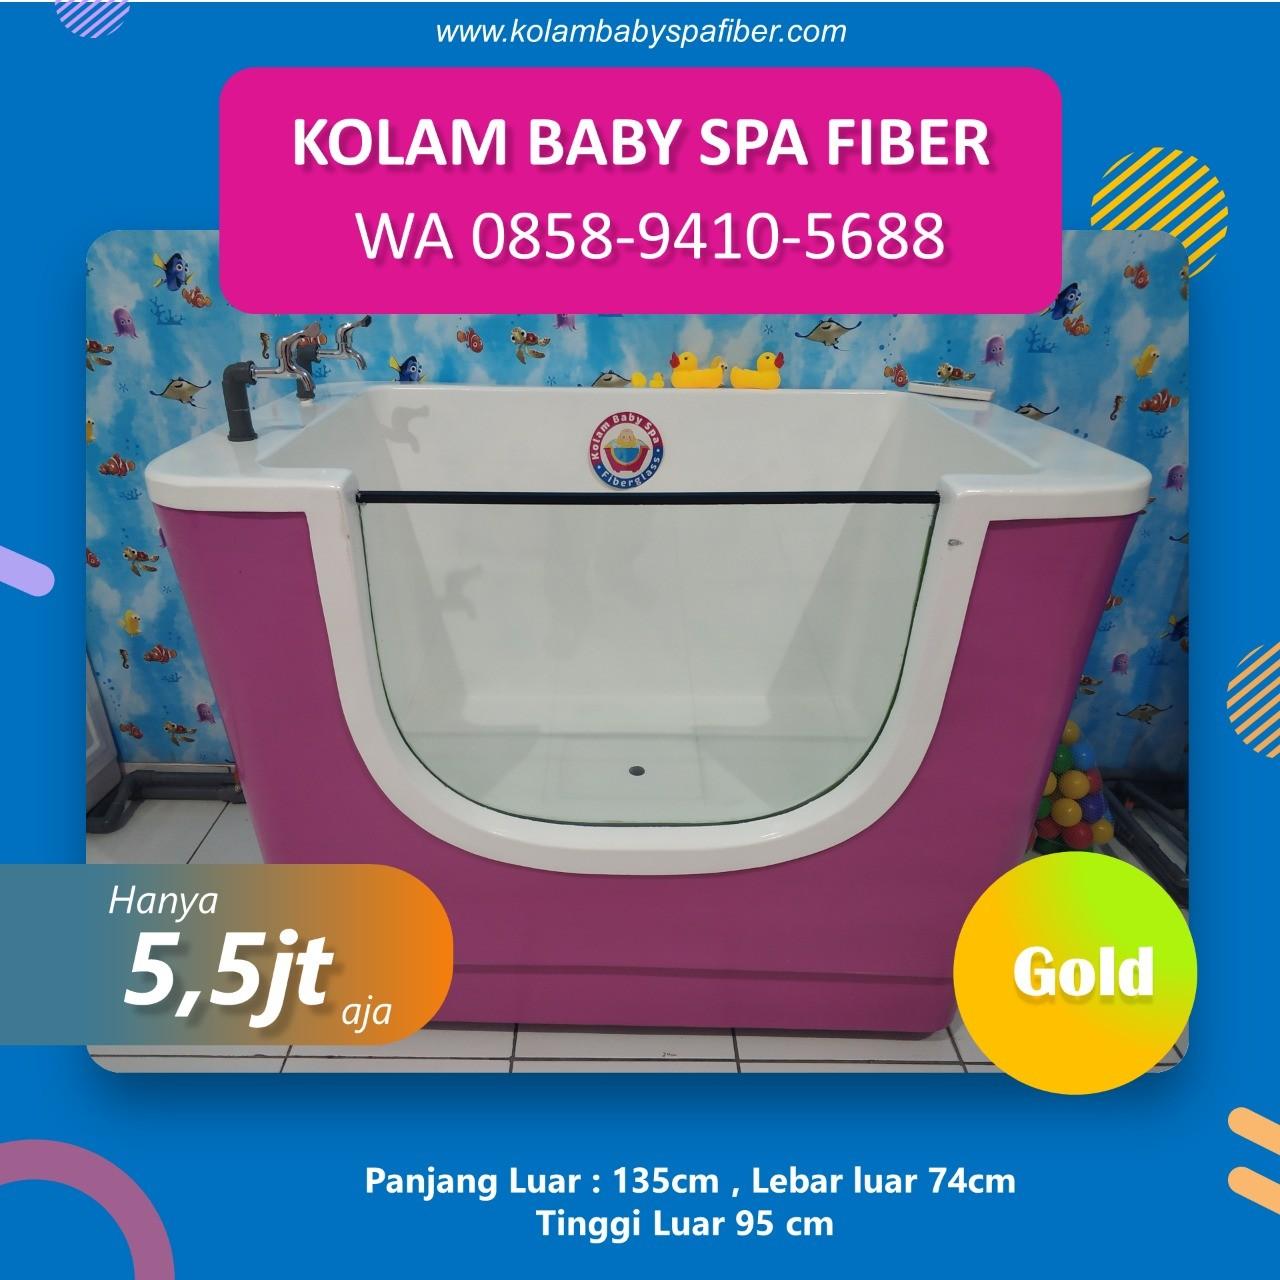 Harga Kolam Baby Spa Flores Timur berkualitas